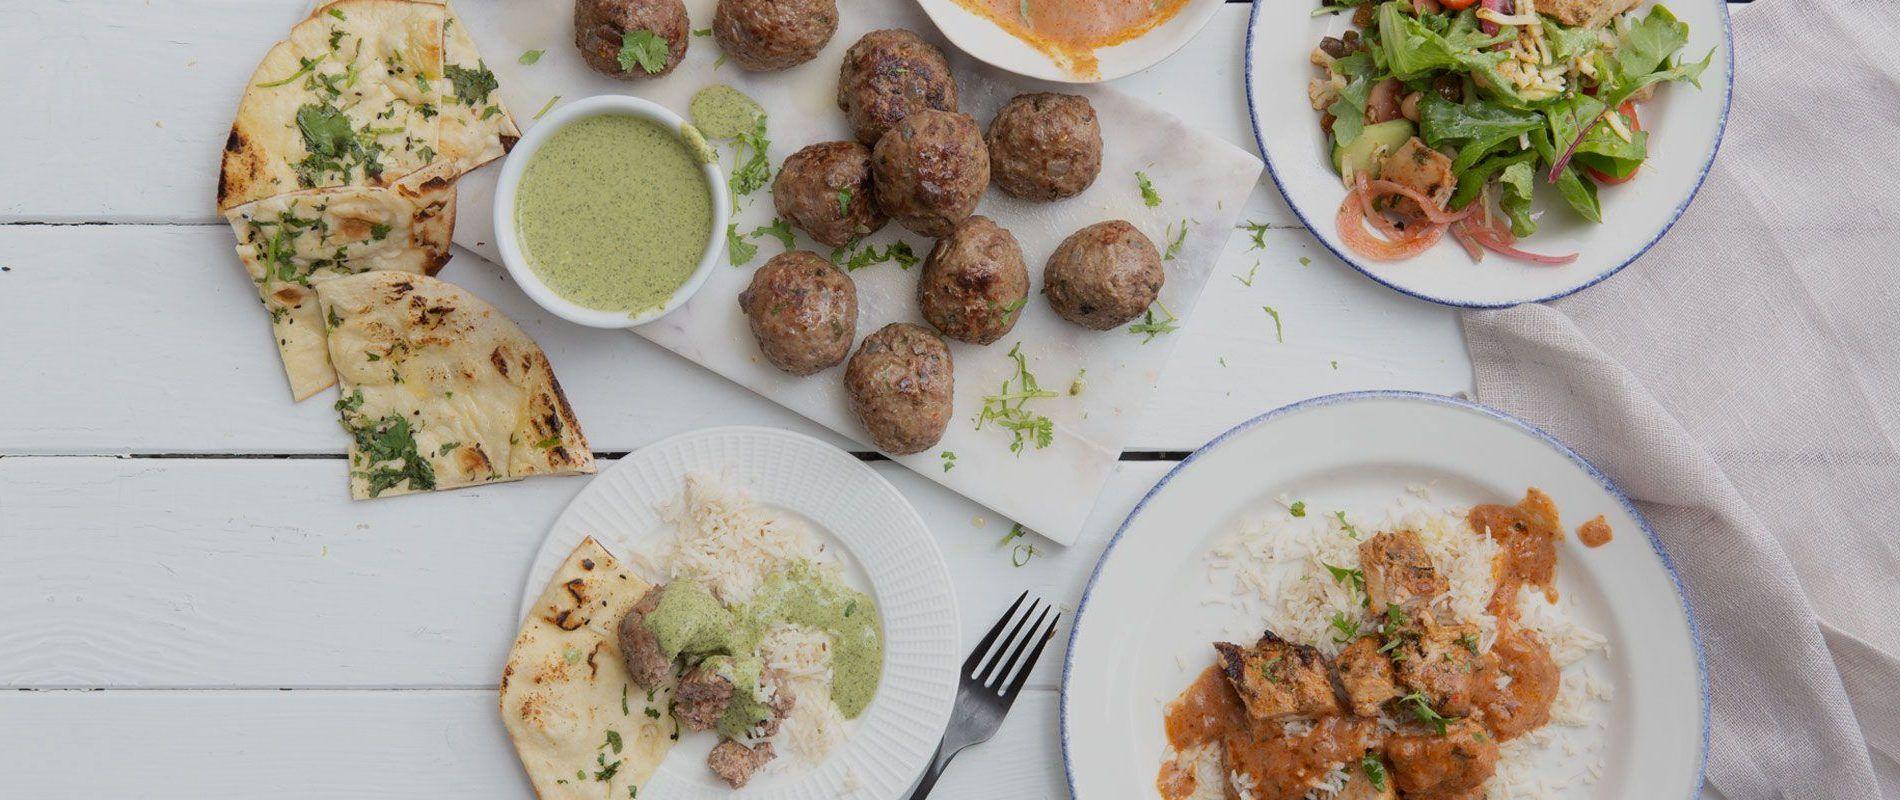 catering meal with naan, halal lamb meatballs, basmati rice, tikka masala and salad